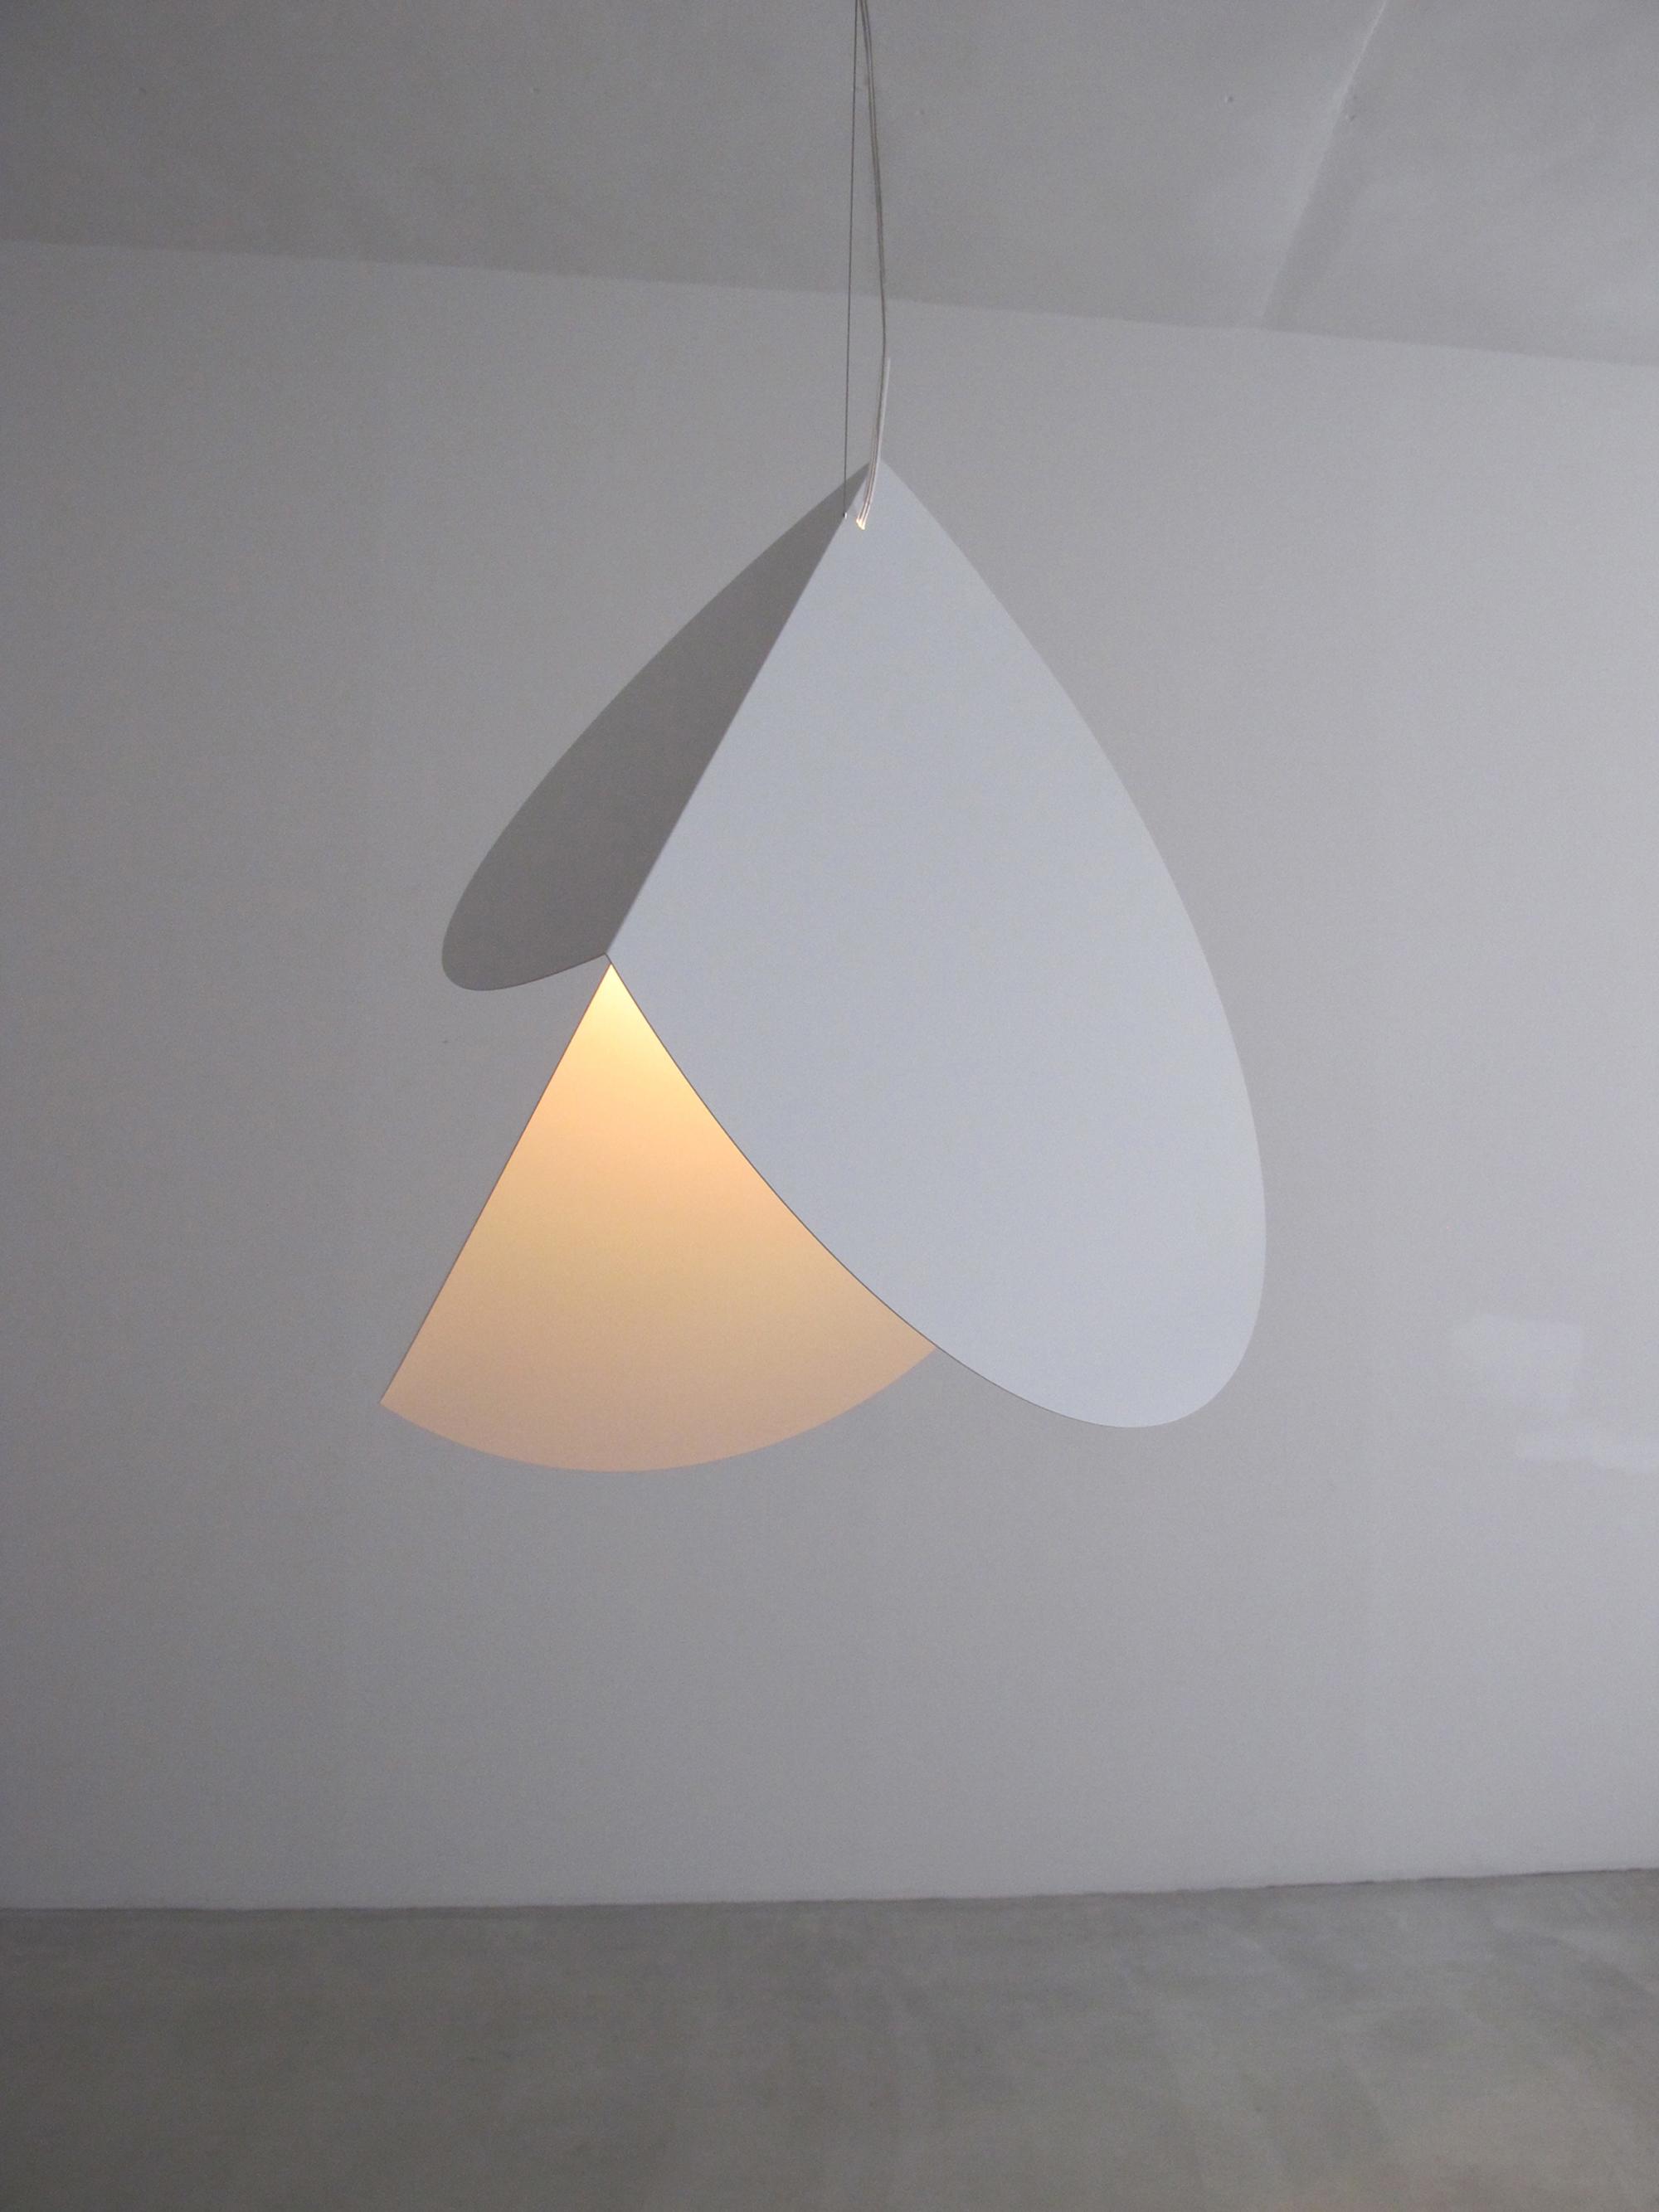 lighting cords. Lighting Cords